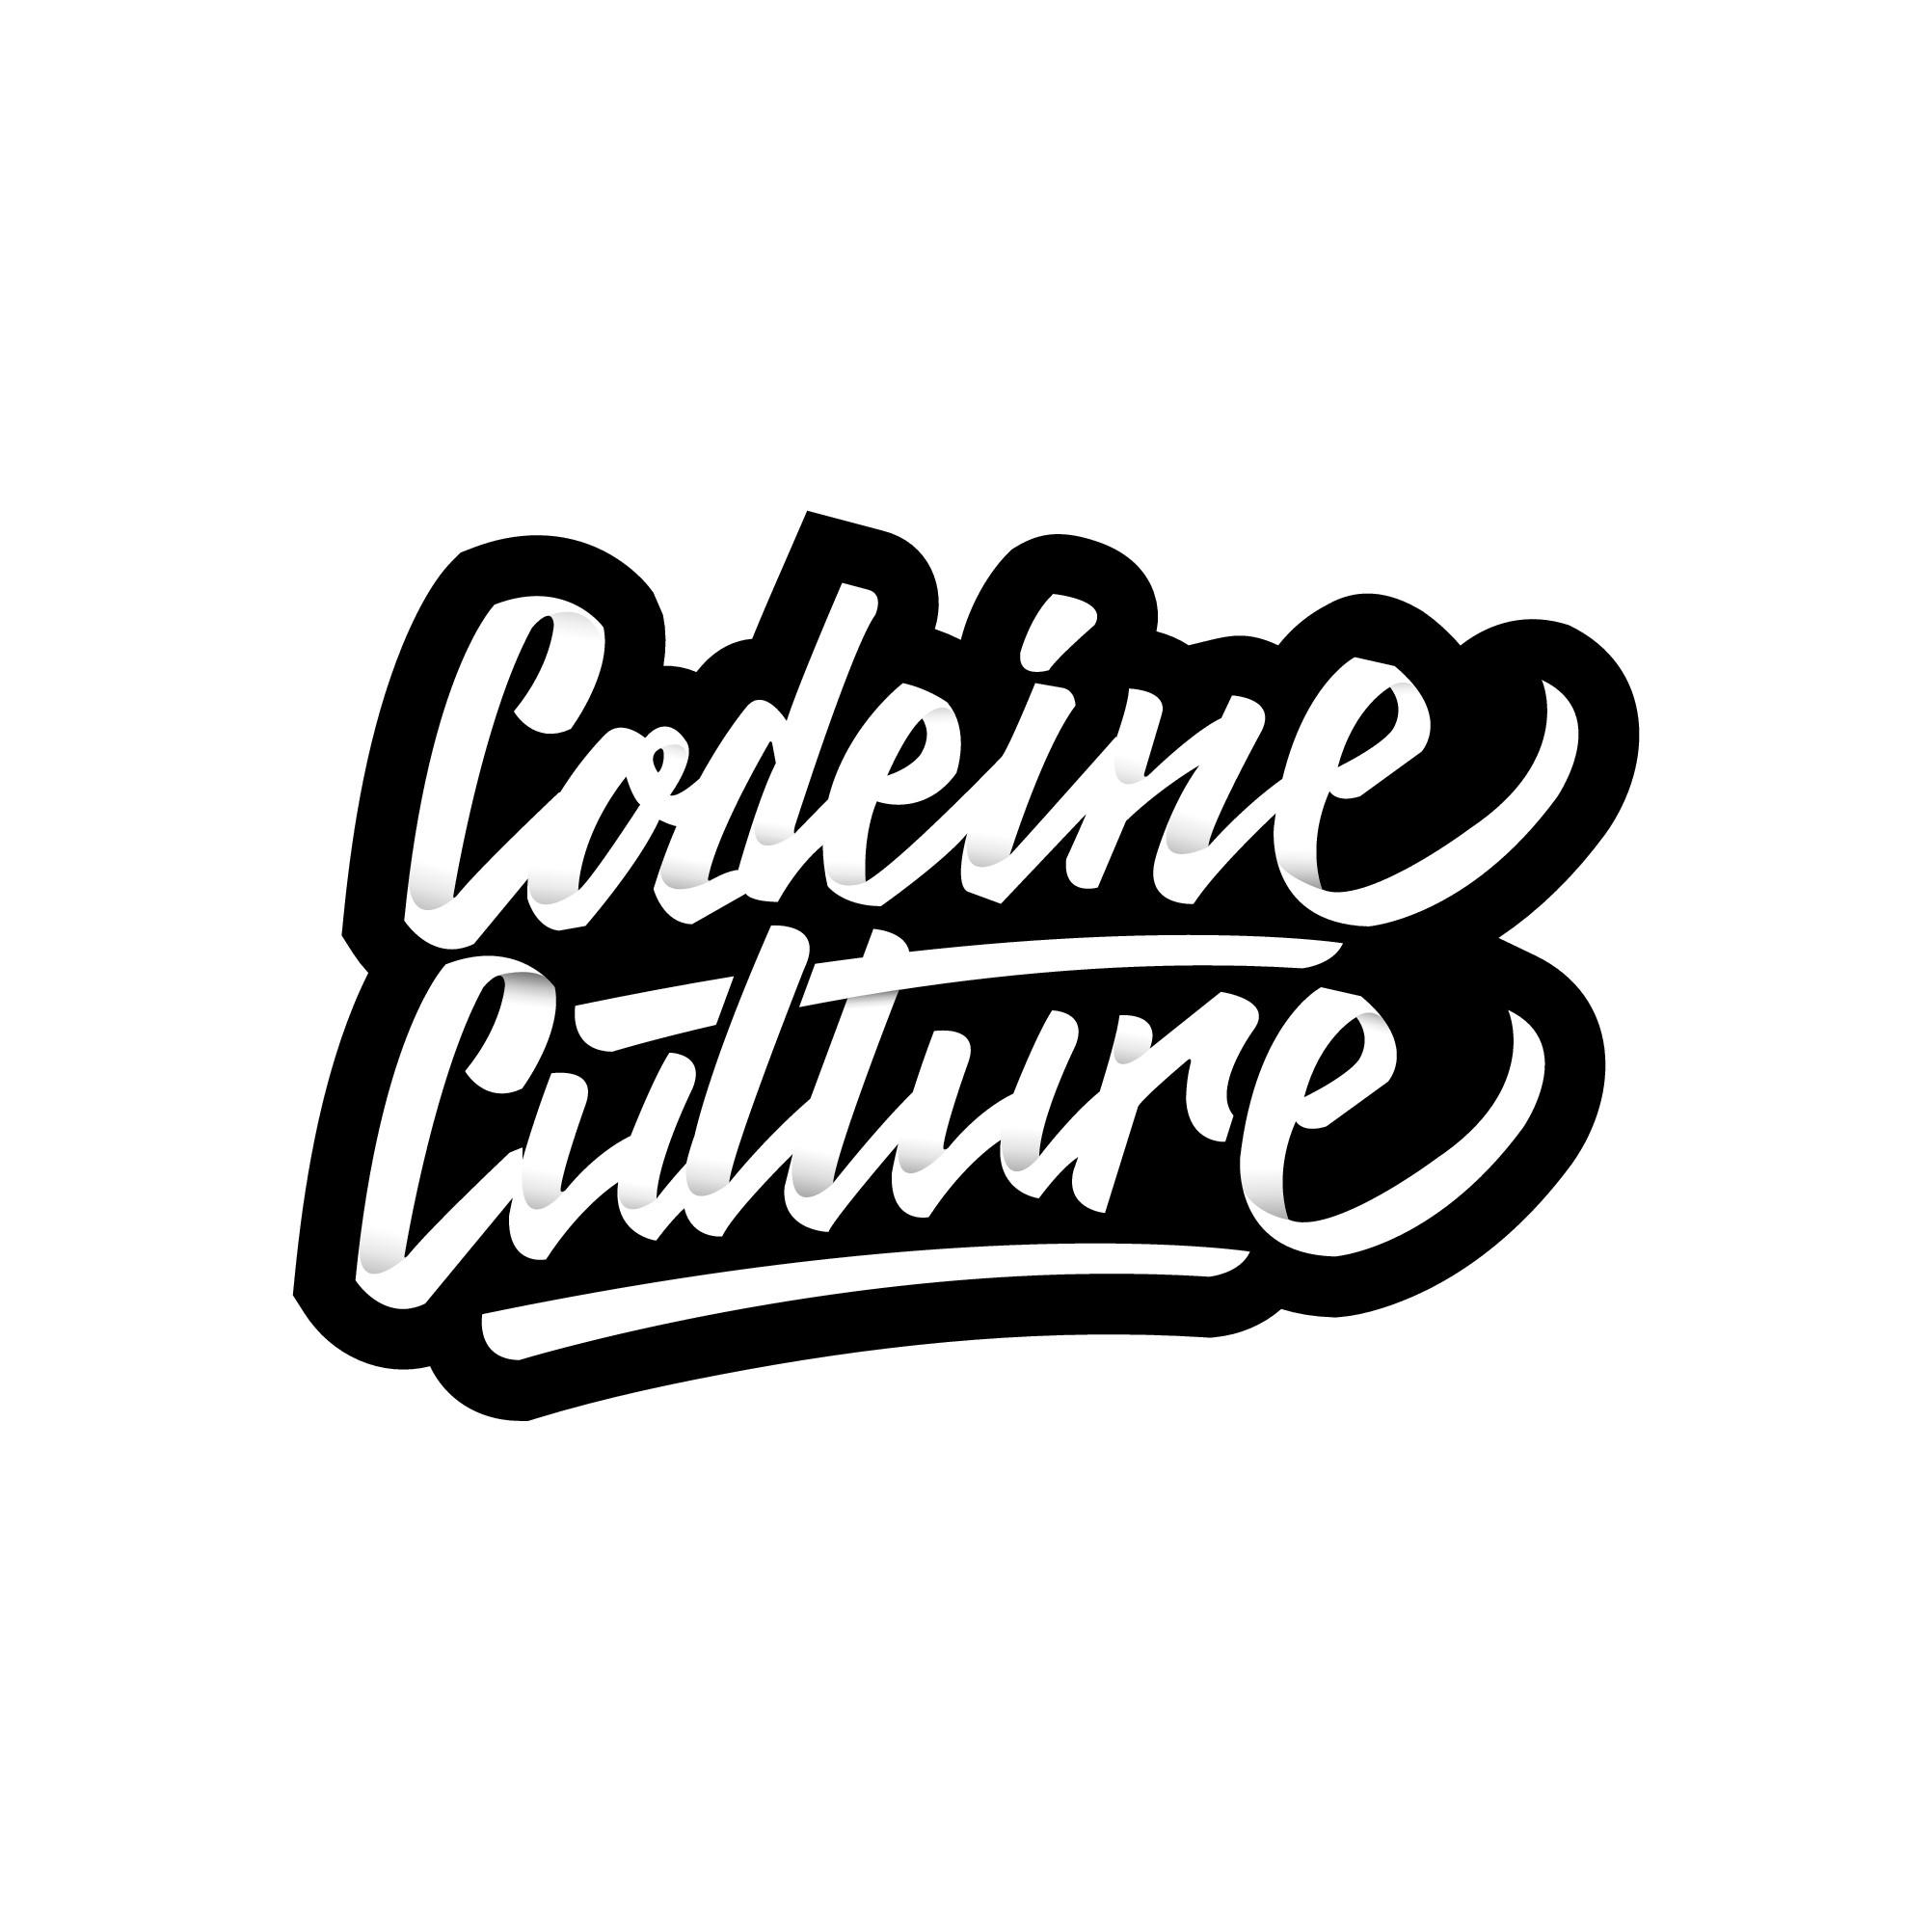 ★ Design an aesthetic vaporwave logo for Codeine Culture ★